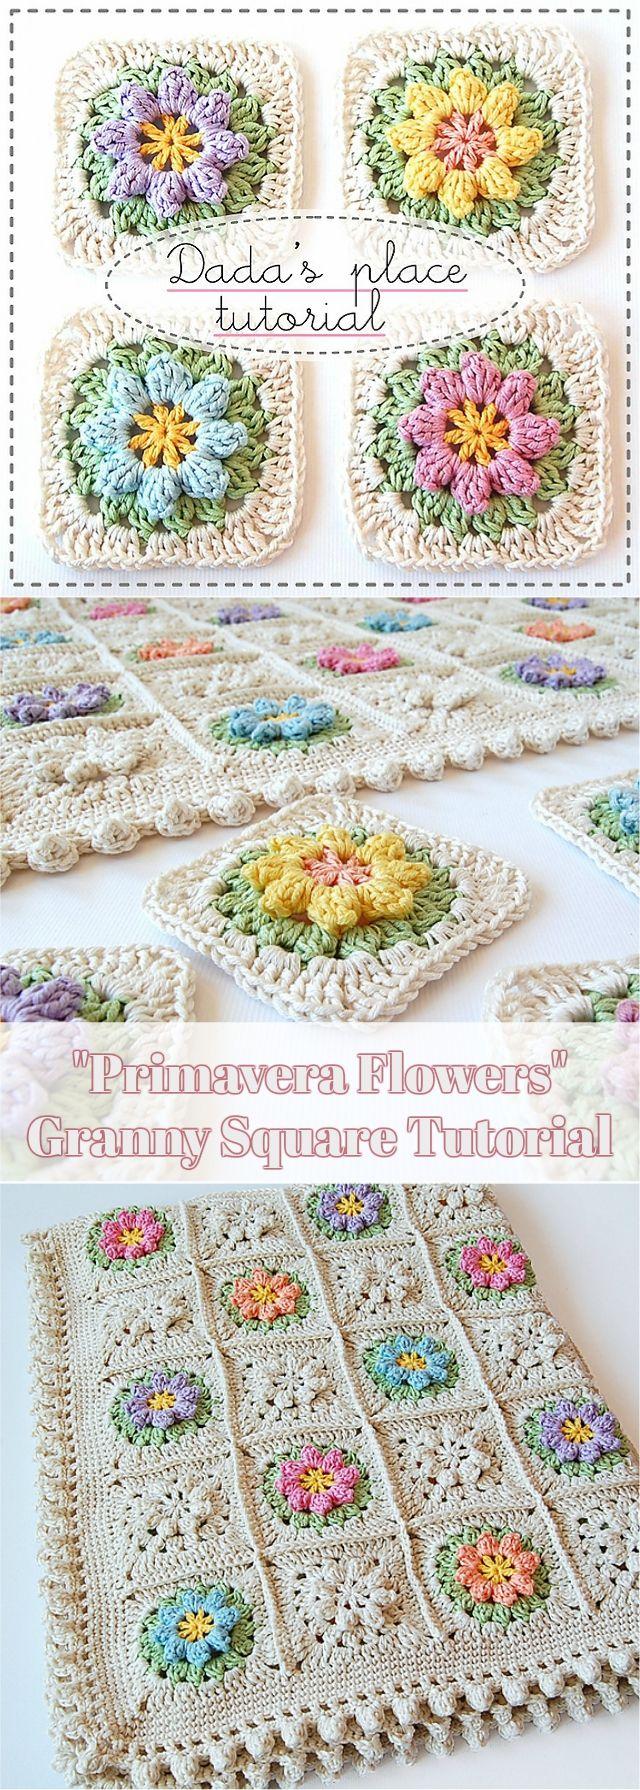 Primavera Flowers Granny Square Pattern + Tutorial   Manta ...